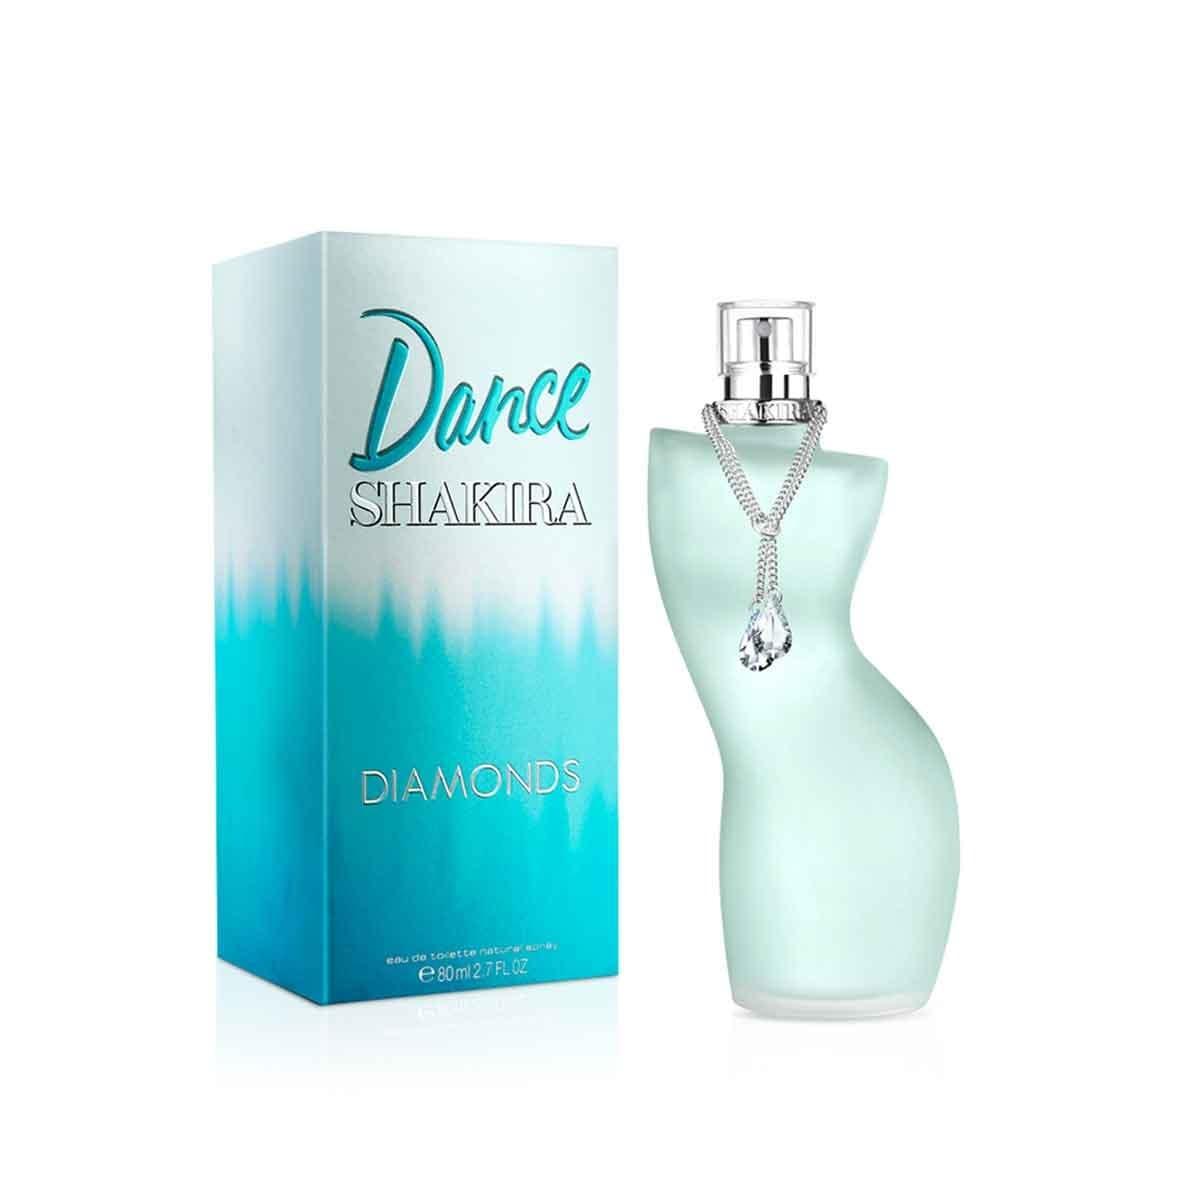 Fragancia para Dama Shakira Dance Diamonds Edt 80Ml